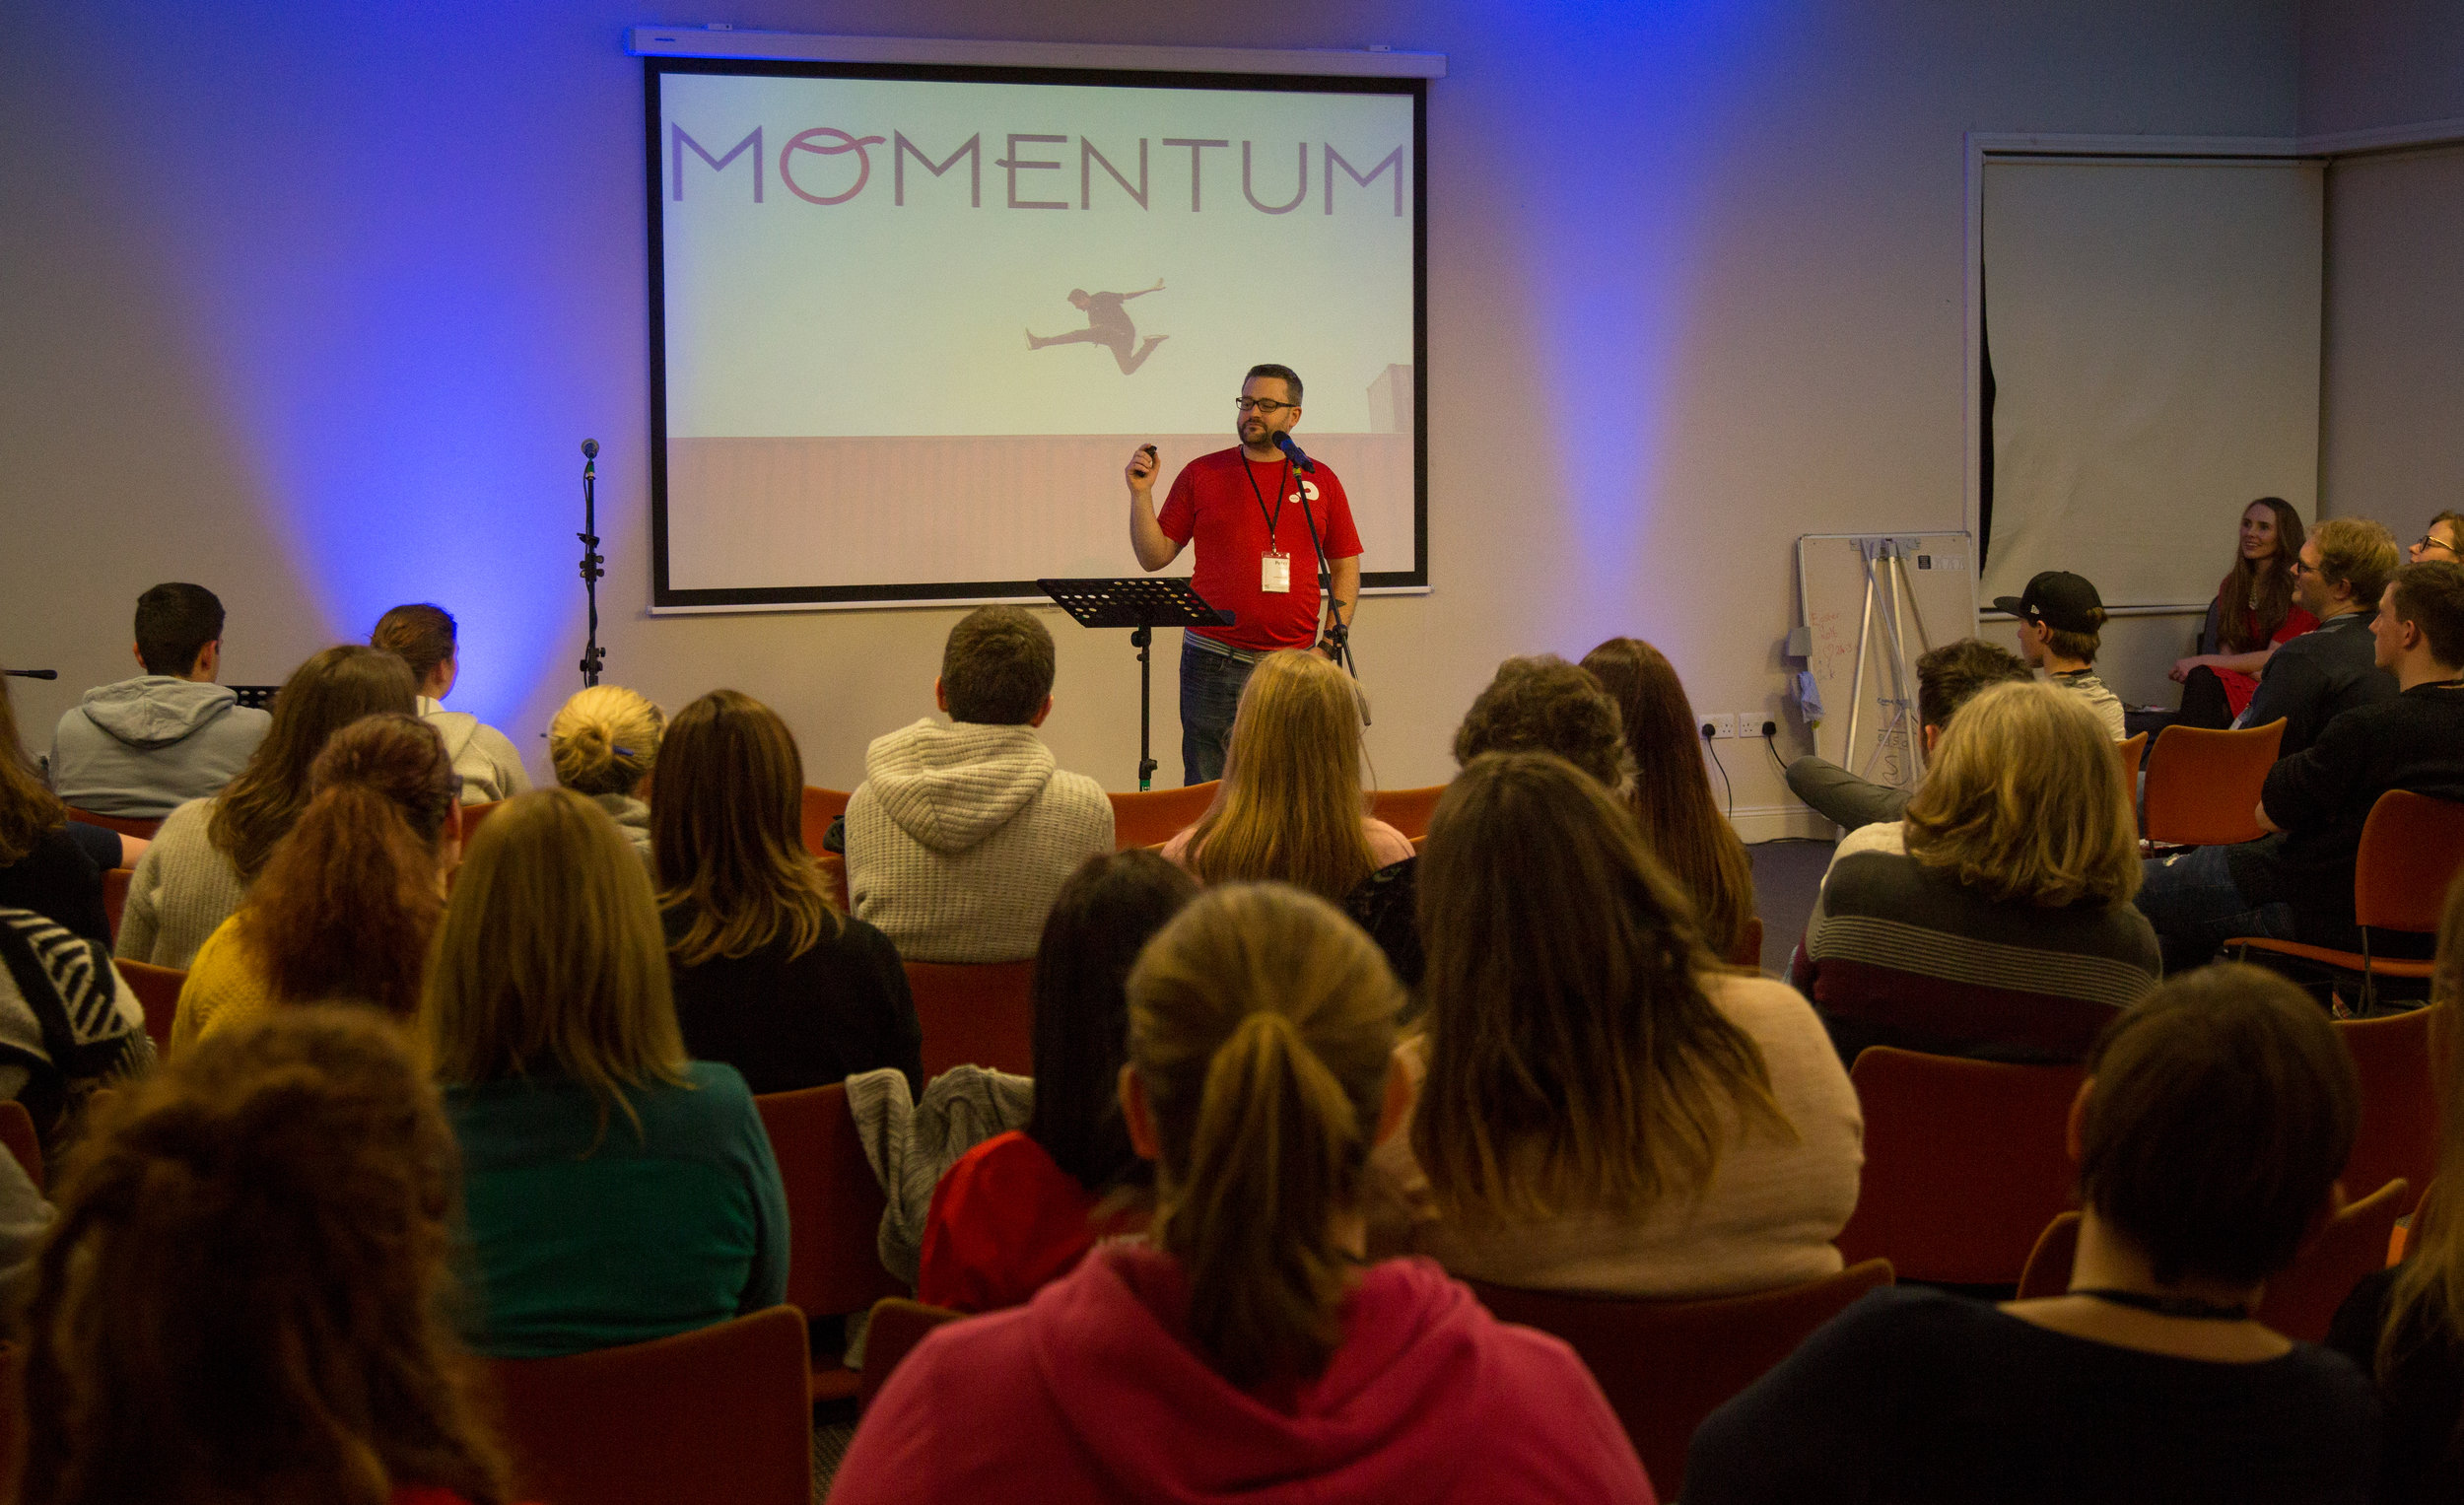 Peter Rigney talking at Momentum.